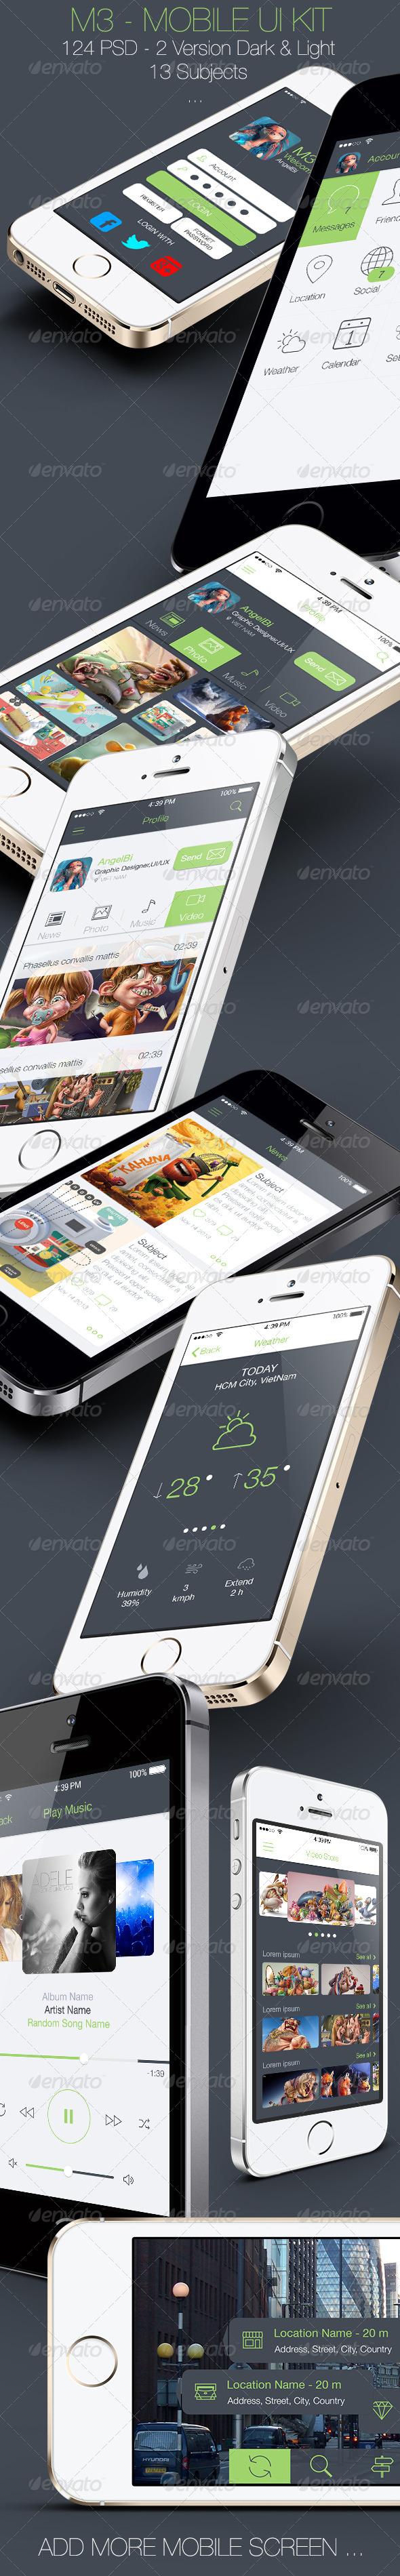 GraphicRiver M3 Mobile UI Kit 6792582